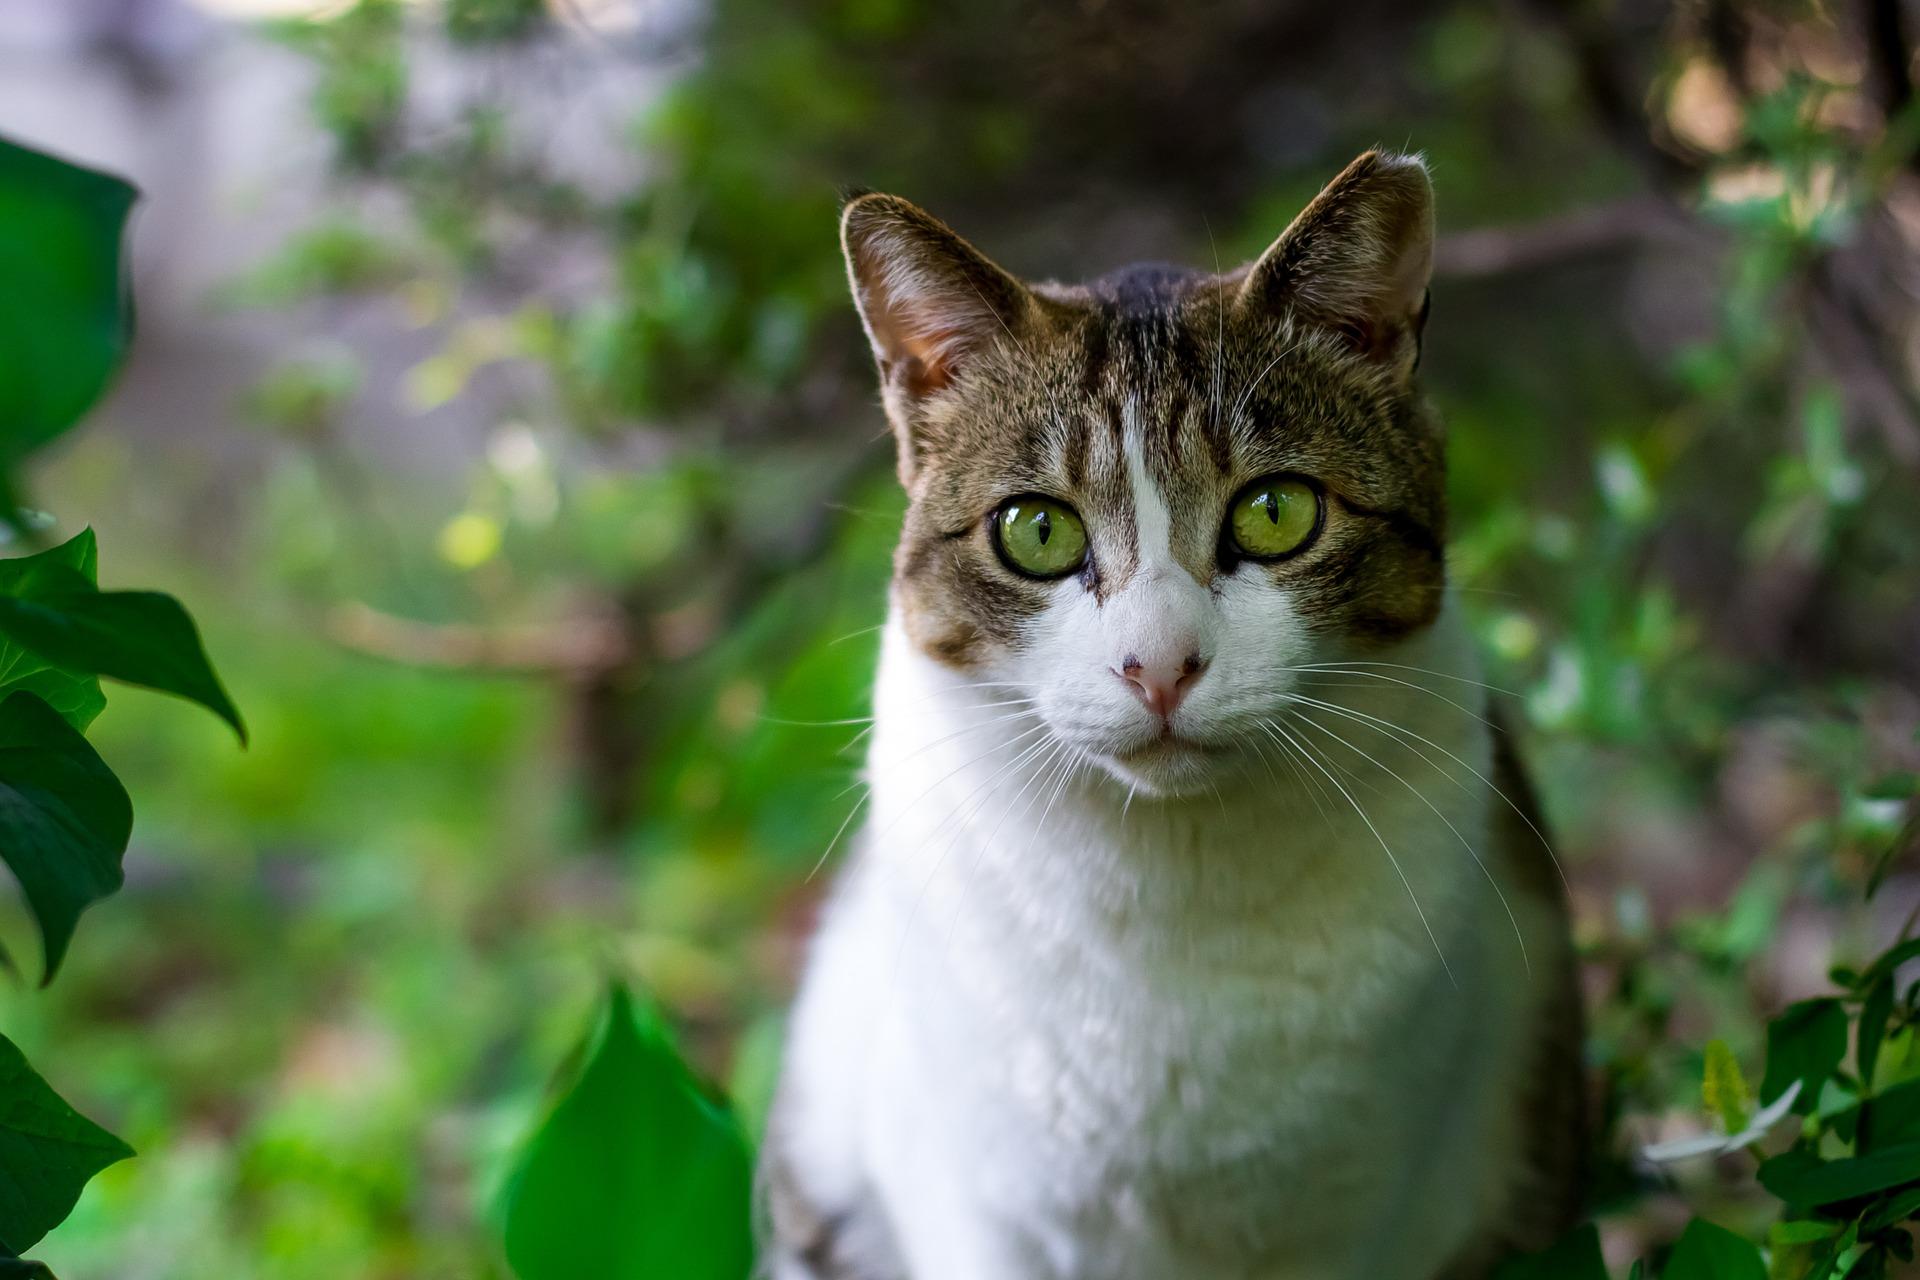 cat-725793_1920.jpg